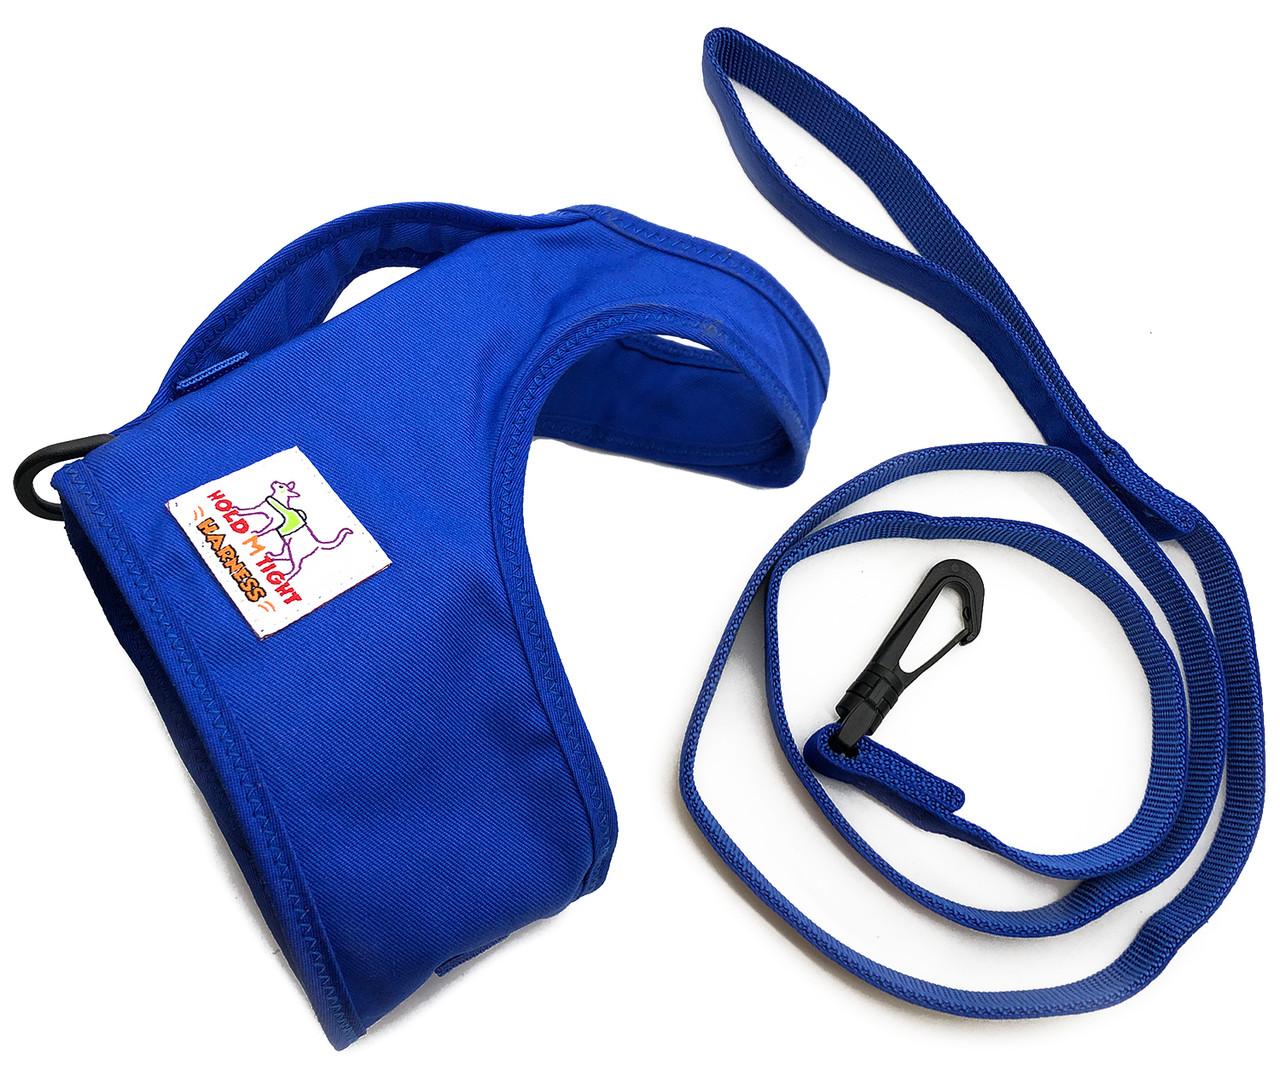 150c0a36872e Hold M Tight -Travel Leash & Harness